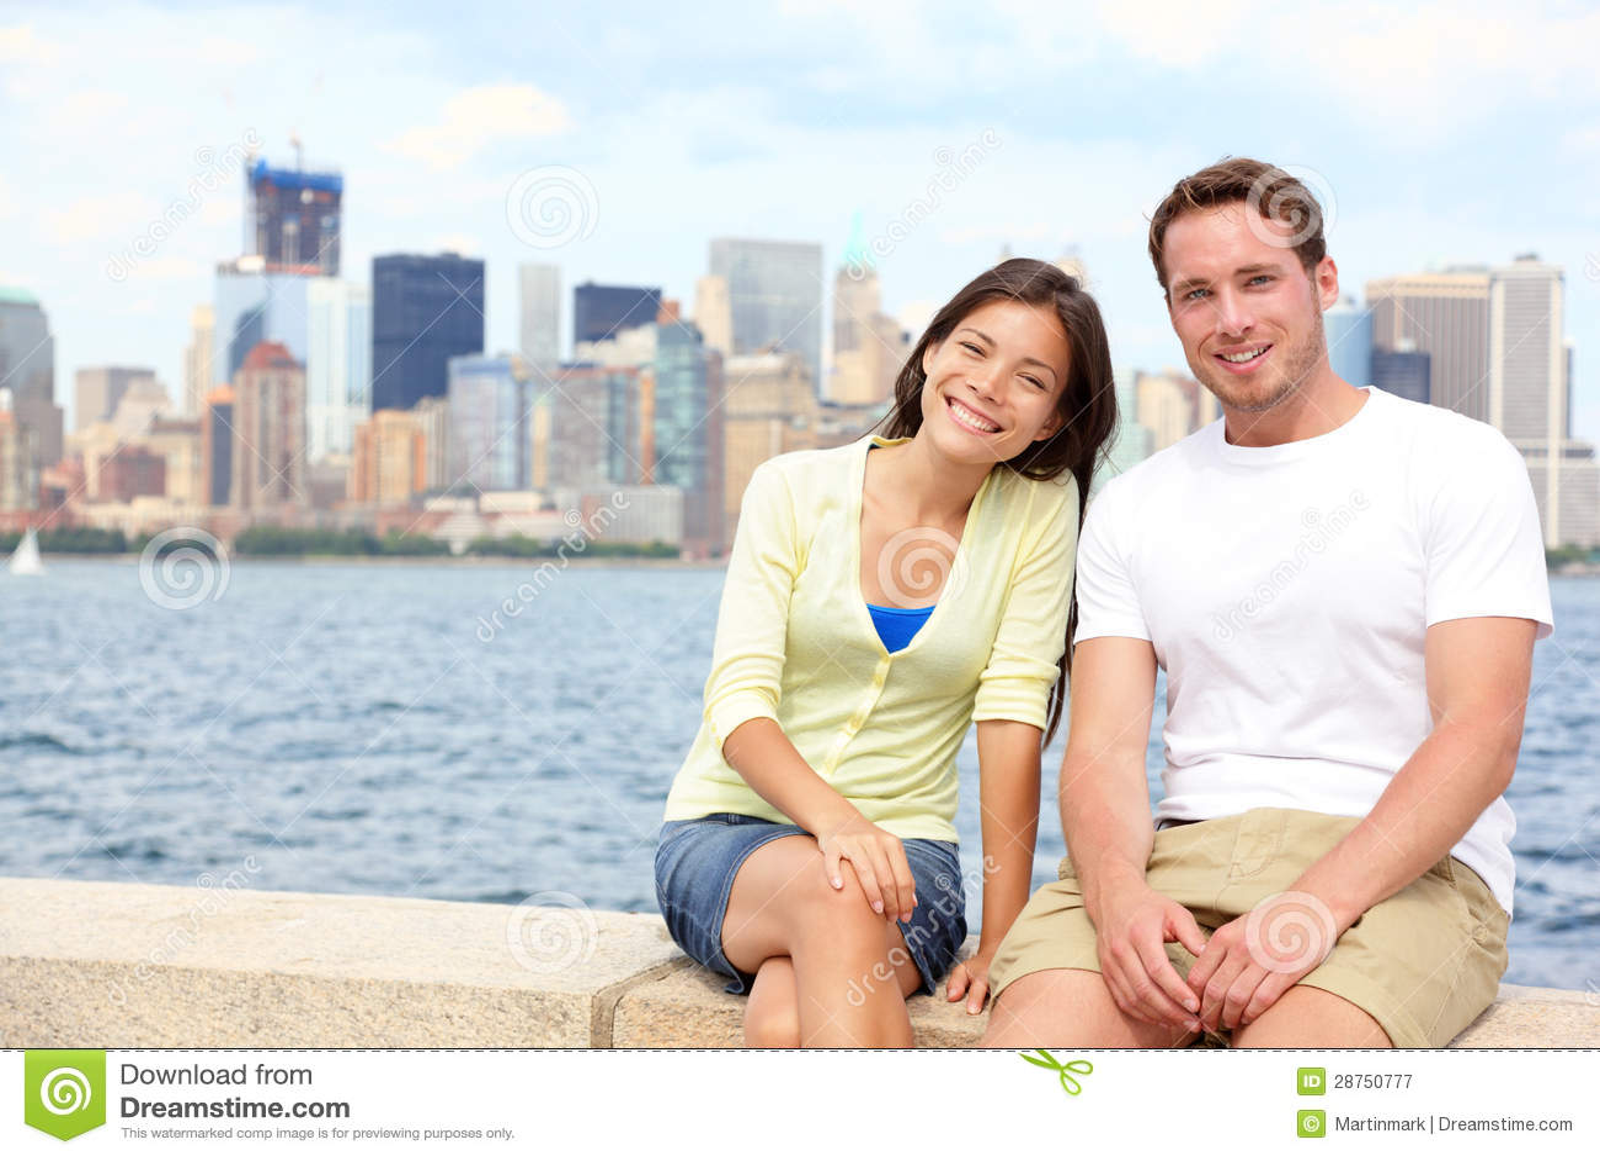 Dating In New York